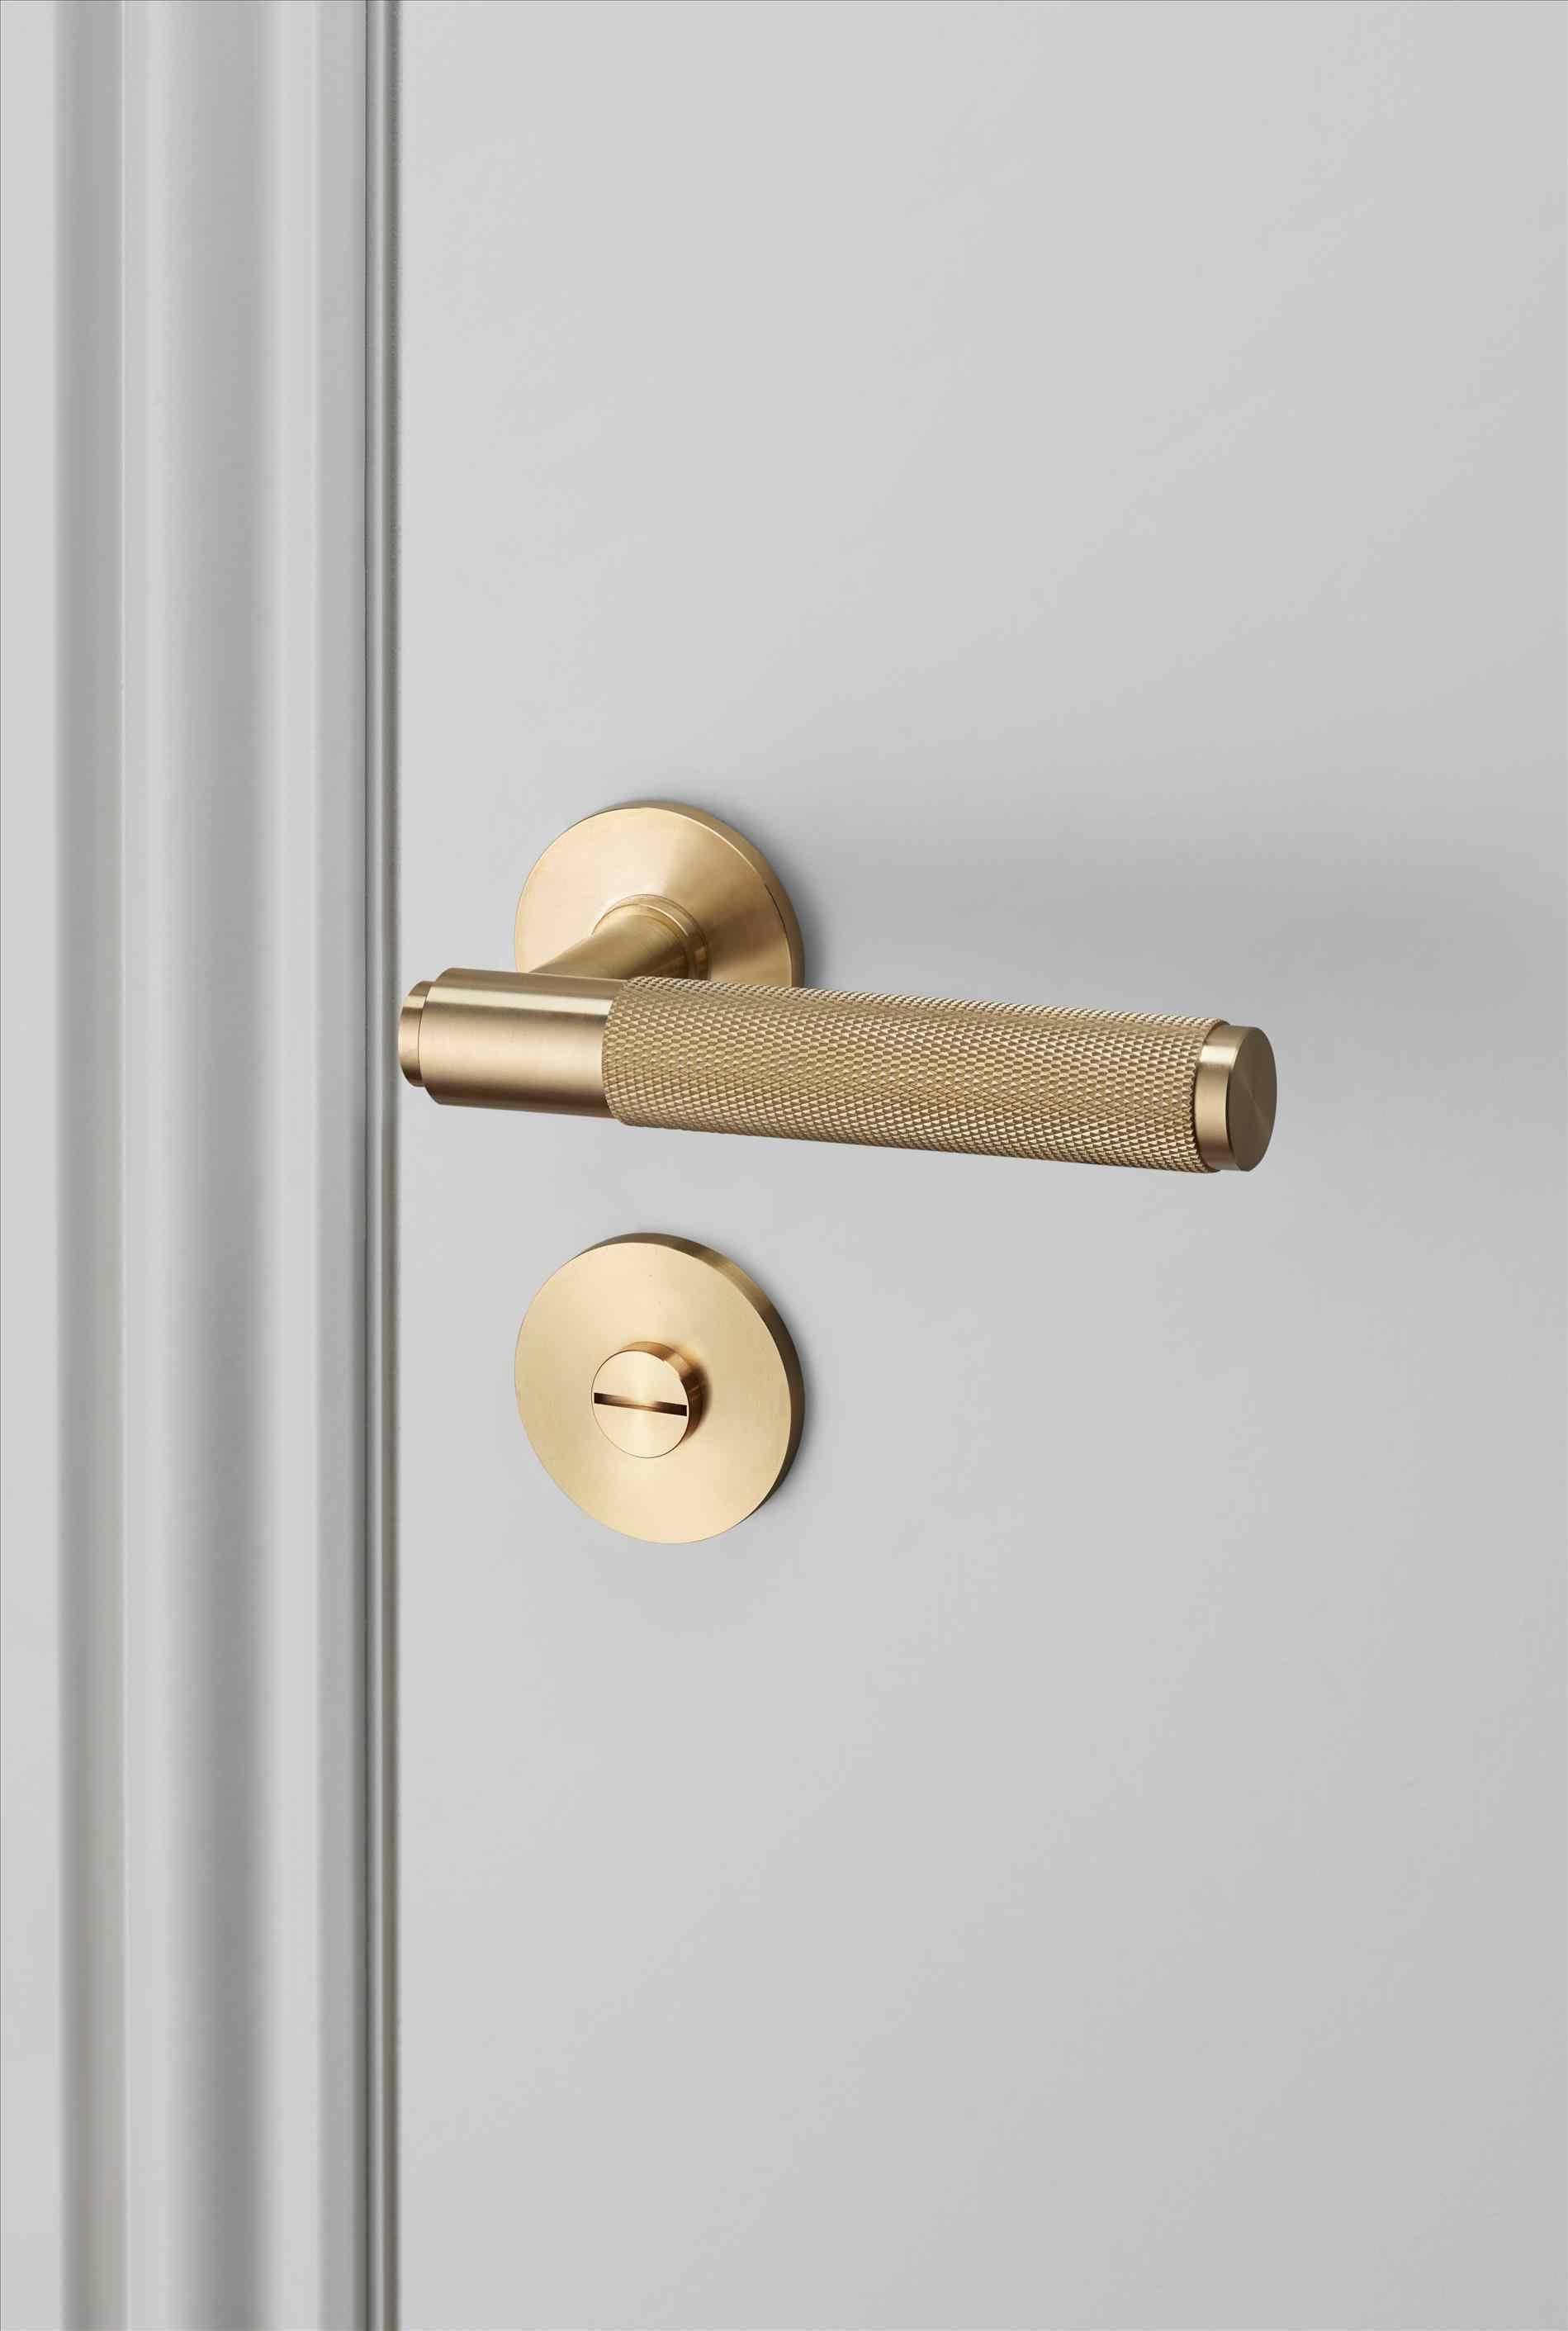 album door losro types of lock names best locks patio